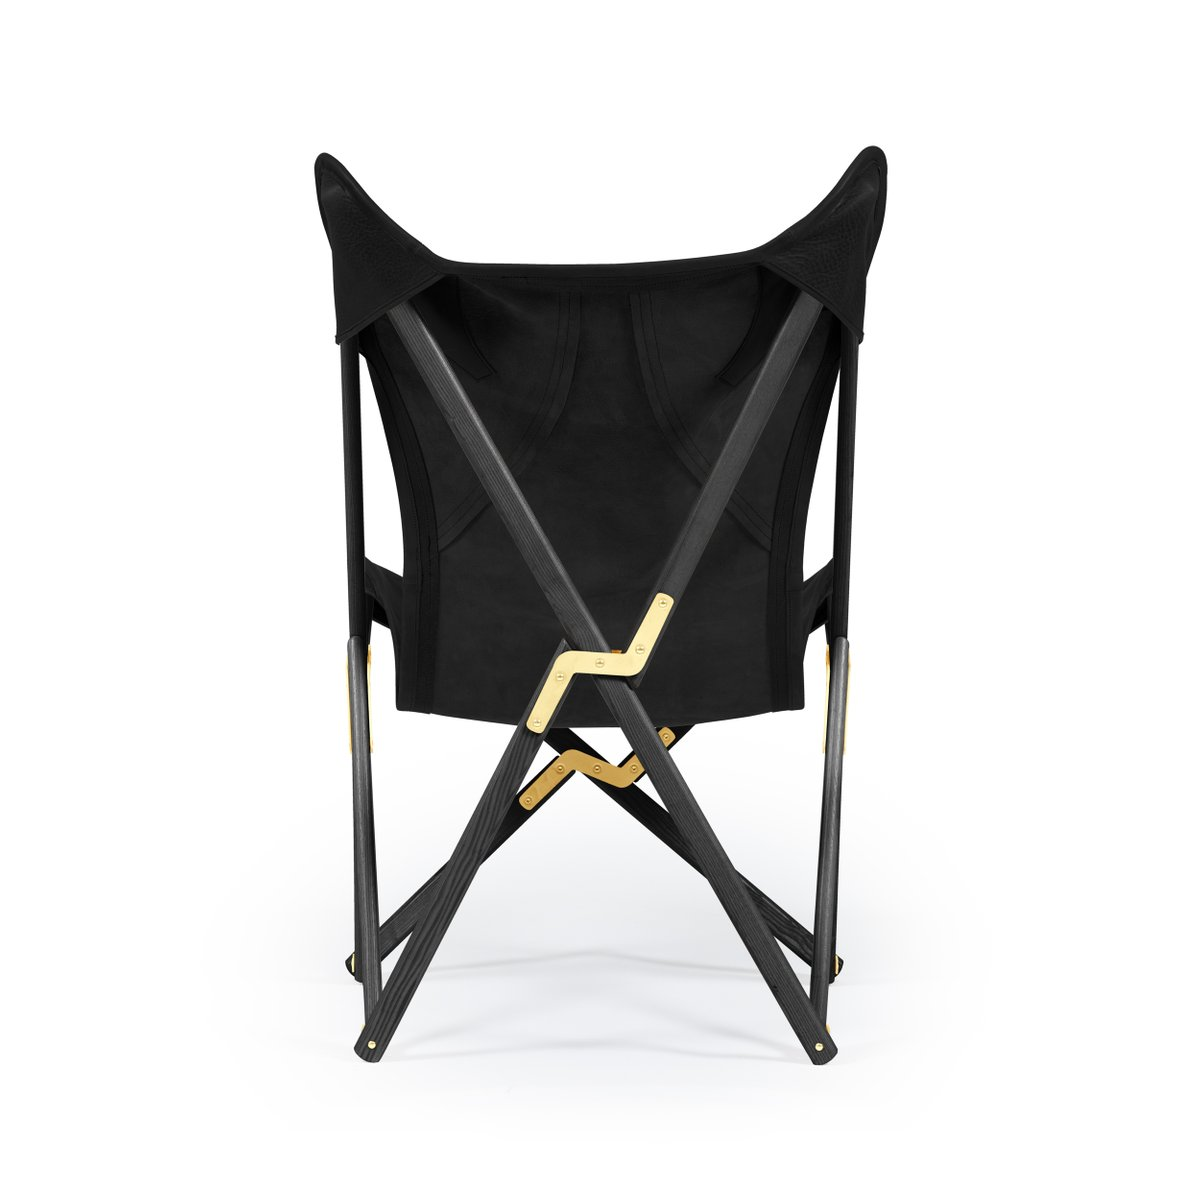 schwarzer telami tripolina leder stuhl von telami bei pamono kaufen. Black Bedroom Furniture Sets. Home Design Ideas